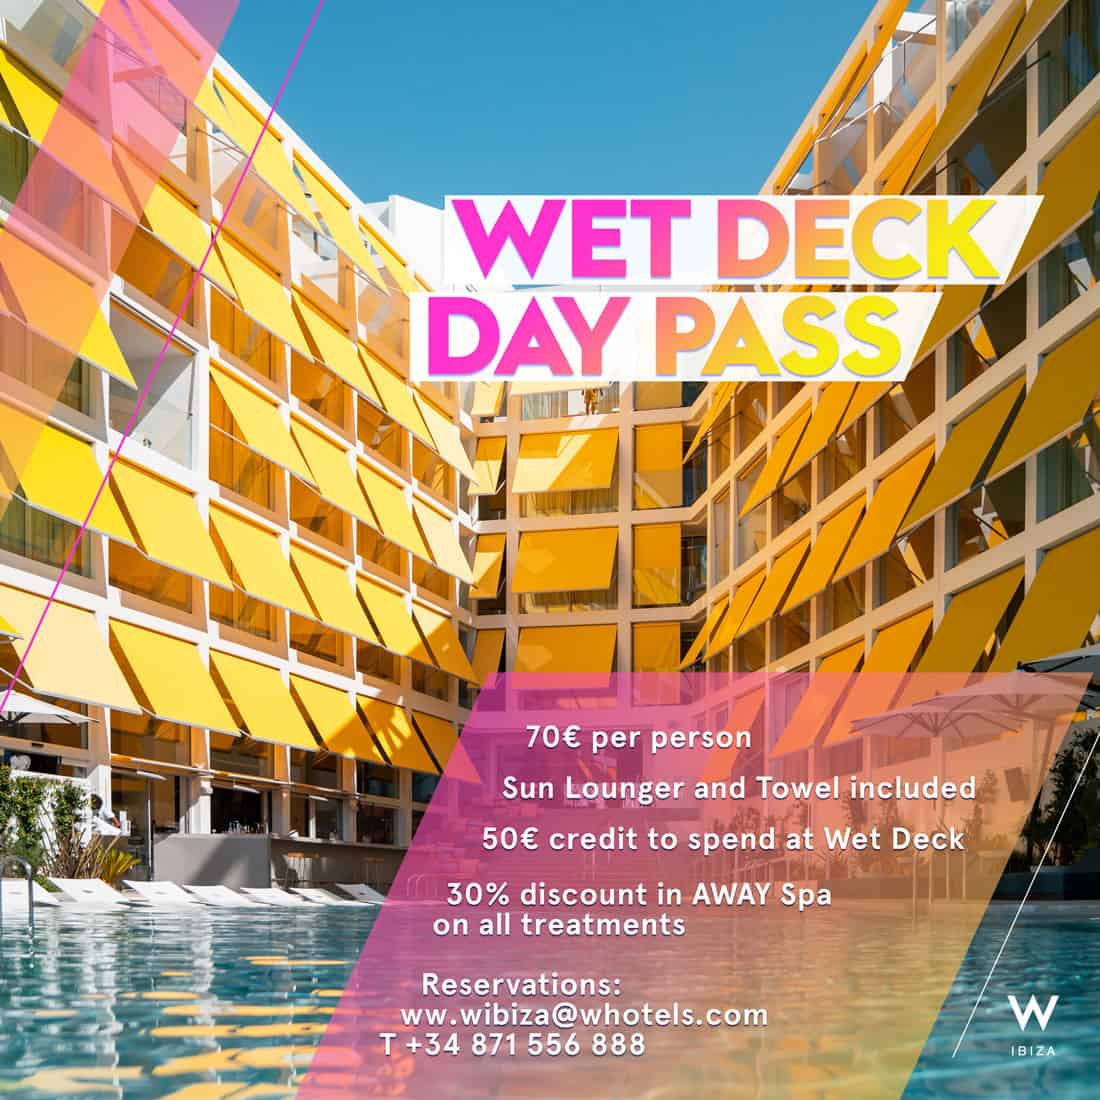 wet-deck-day pass-w-ibiza-hotel-2021-welcometoibiza